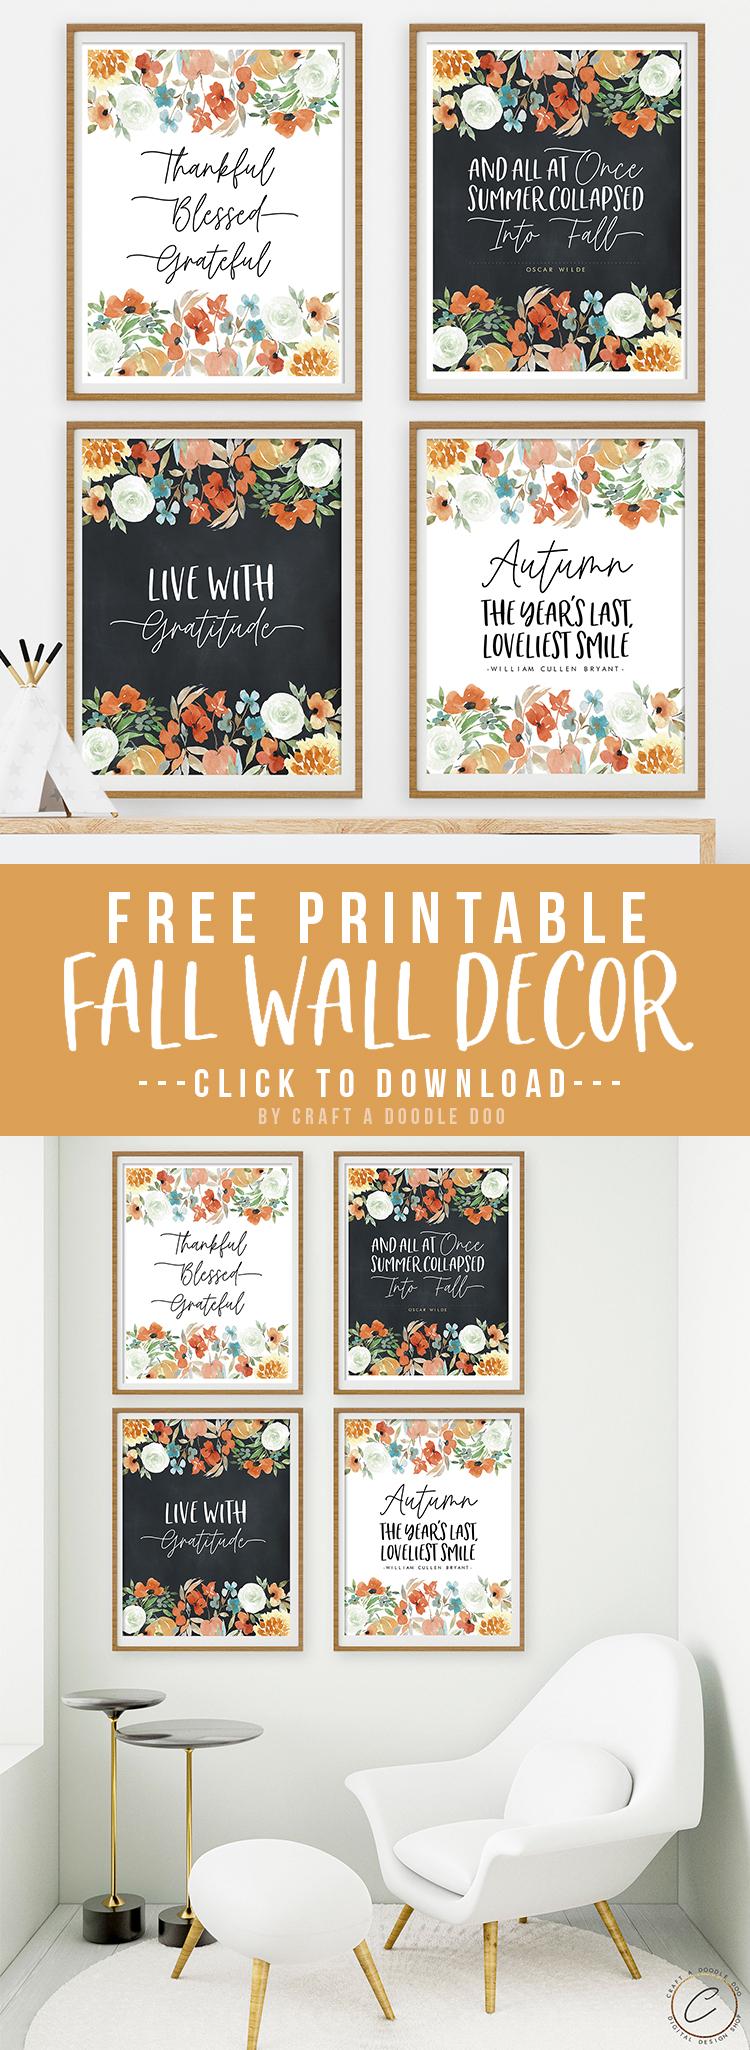 Free Fall Printable Wall Art Set | Watercolor Floral Farmhouse Style Autumn Digital Wall Decor by Craft A Doodle Doo #freefallprintablesbundle #freeautumnwallart #freefallwallgallery